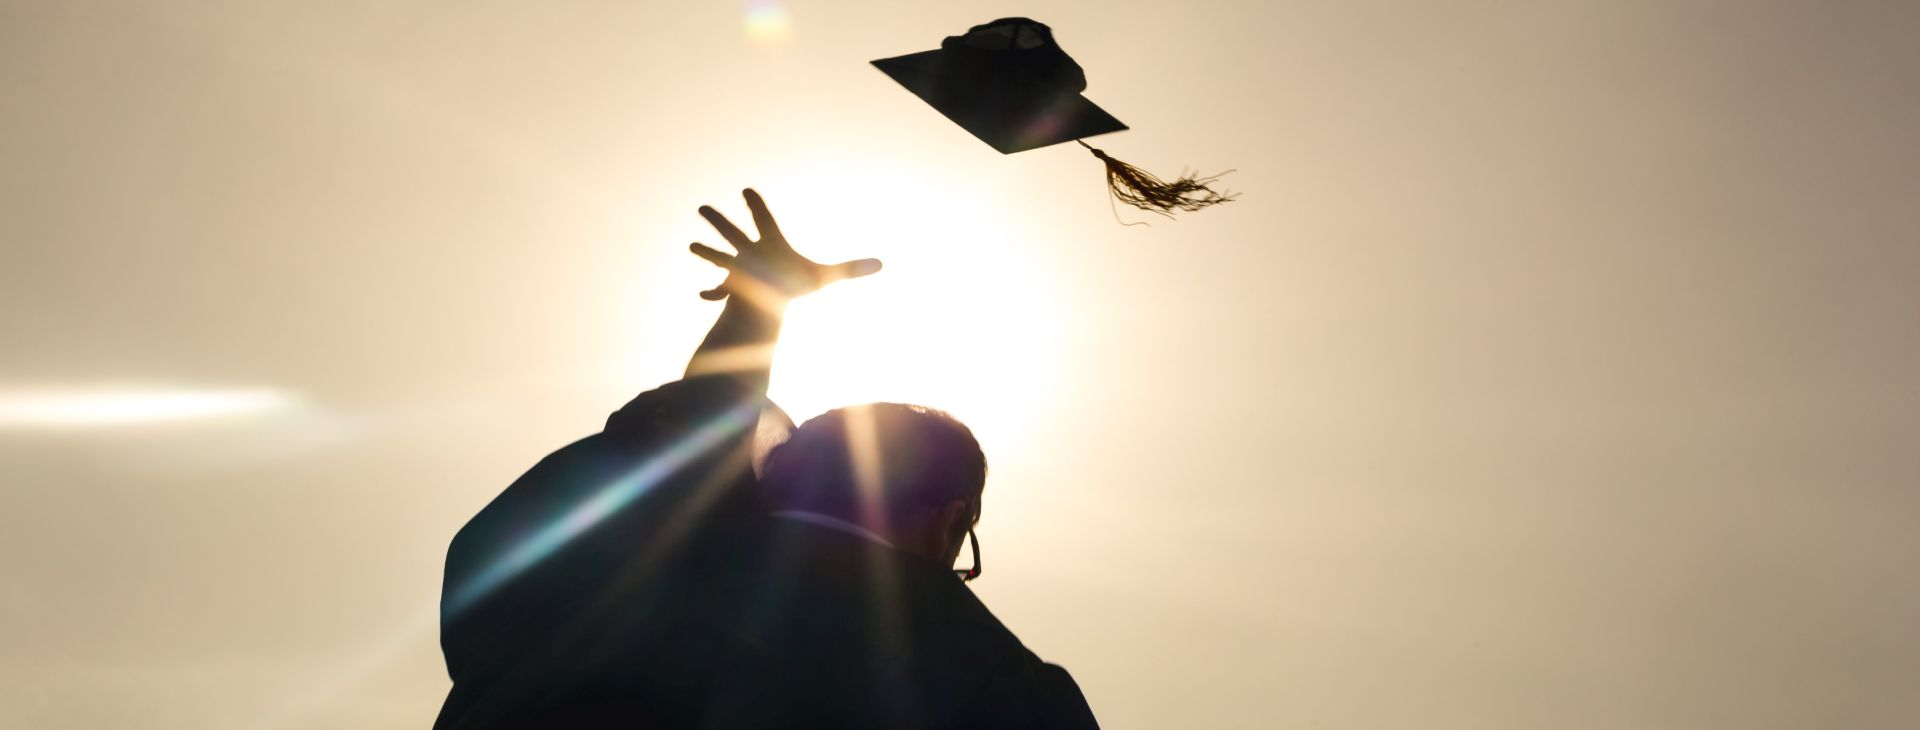 grad-student-throwing-up-cap